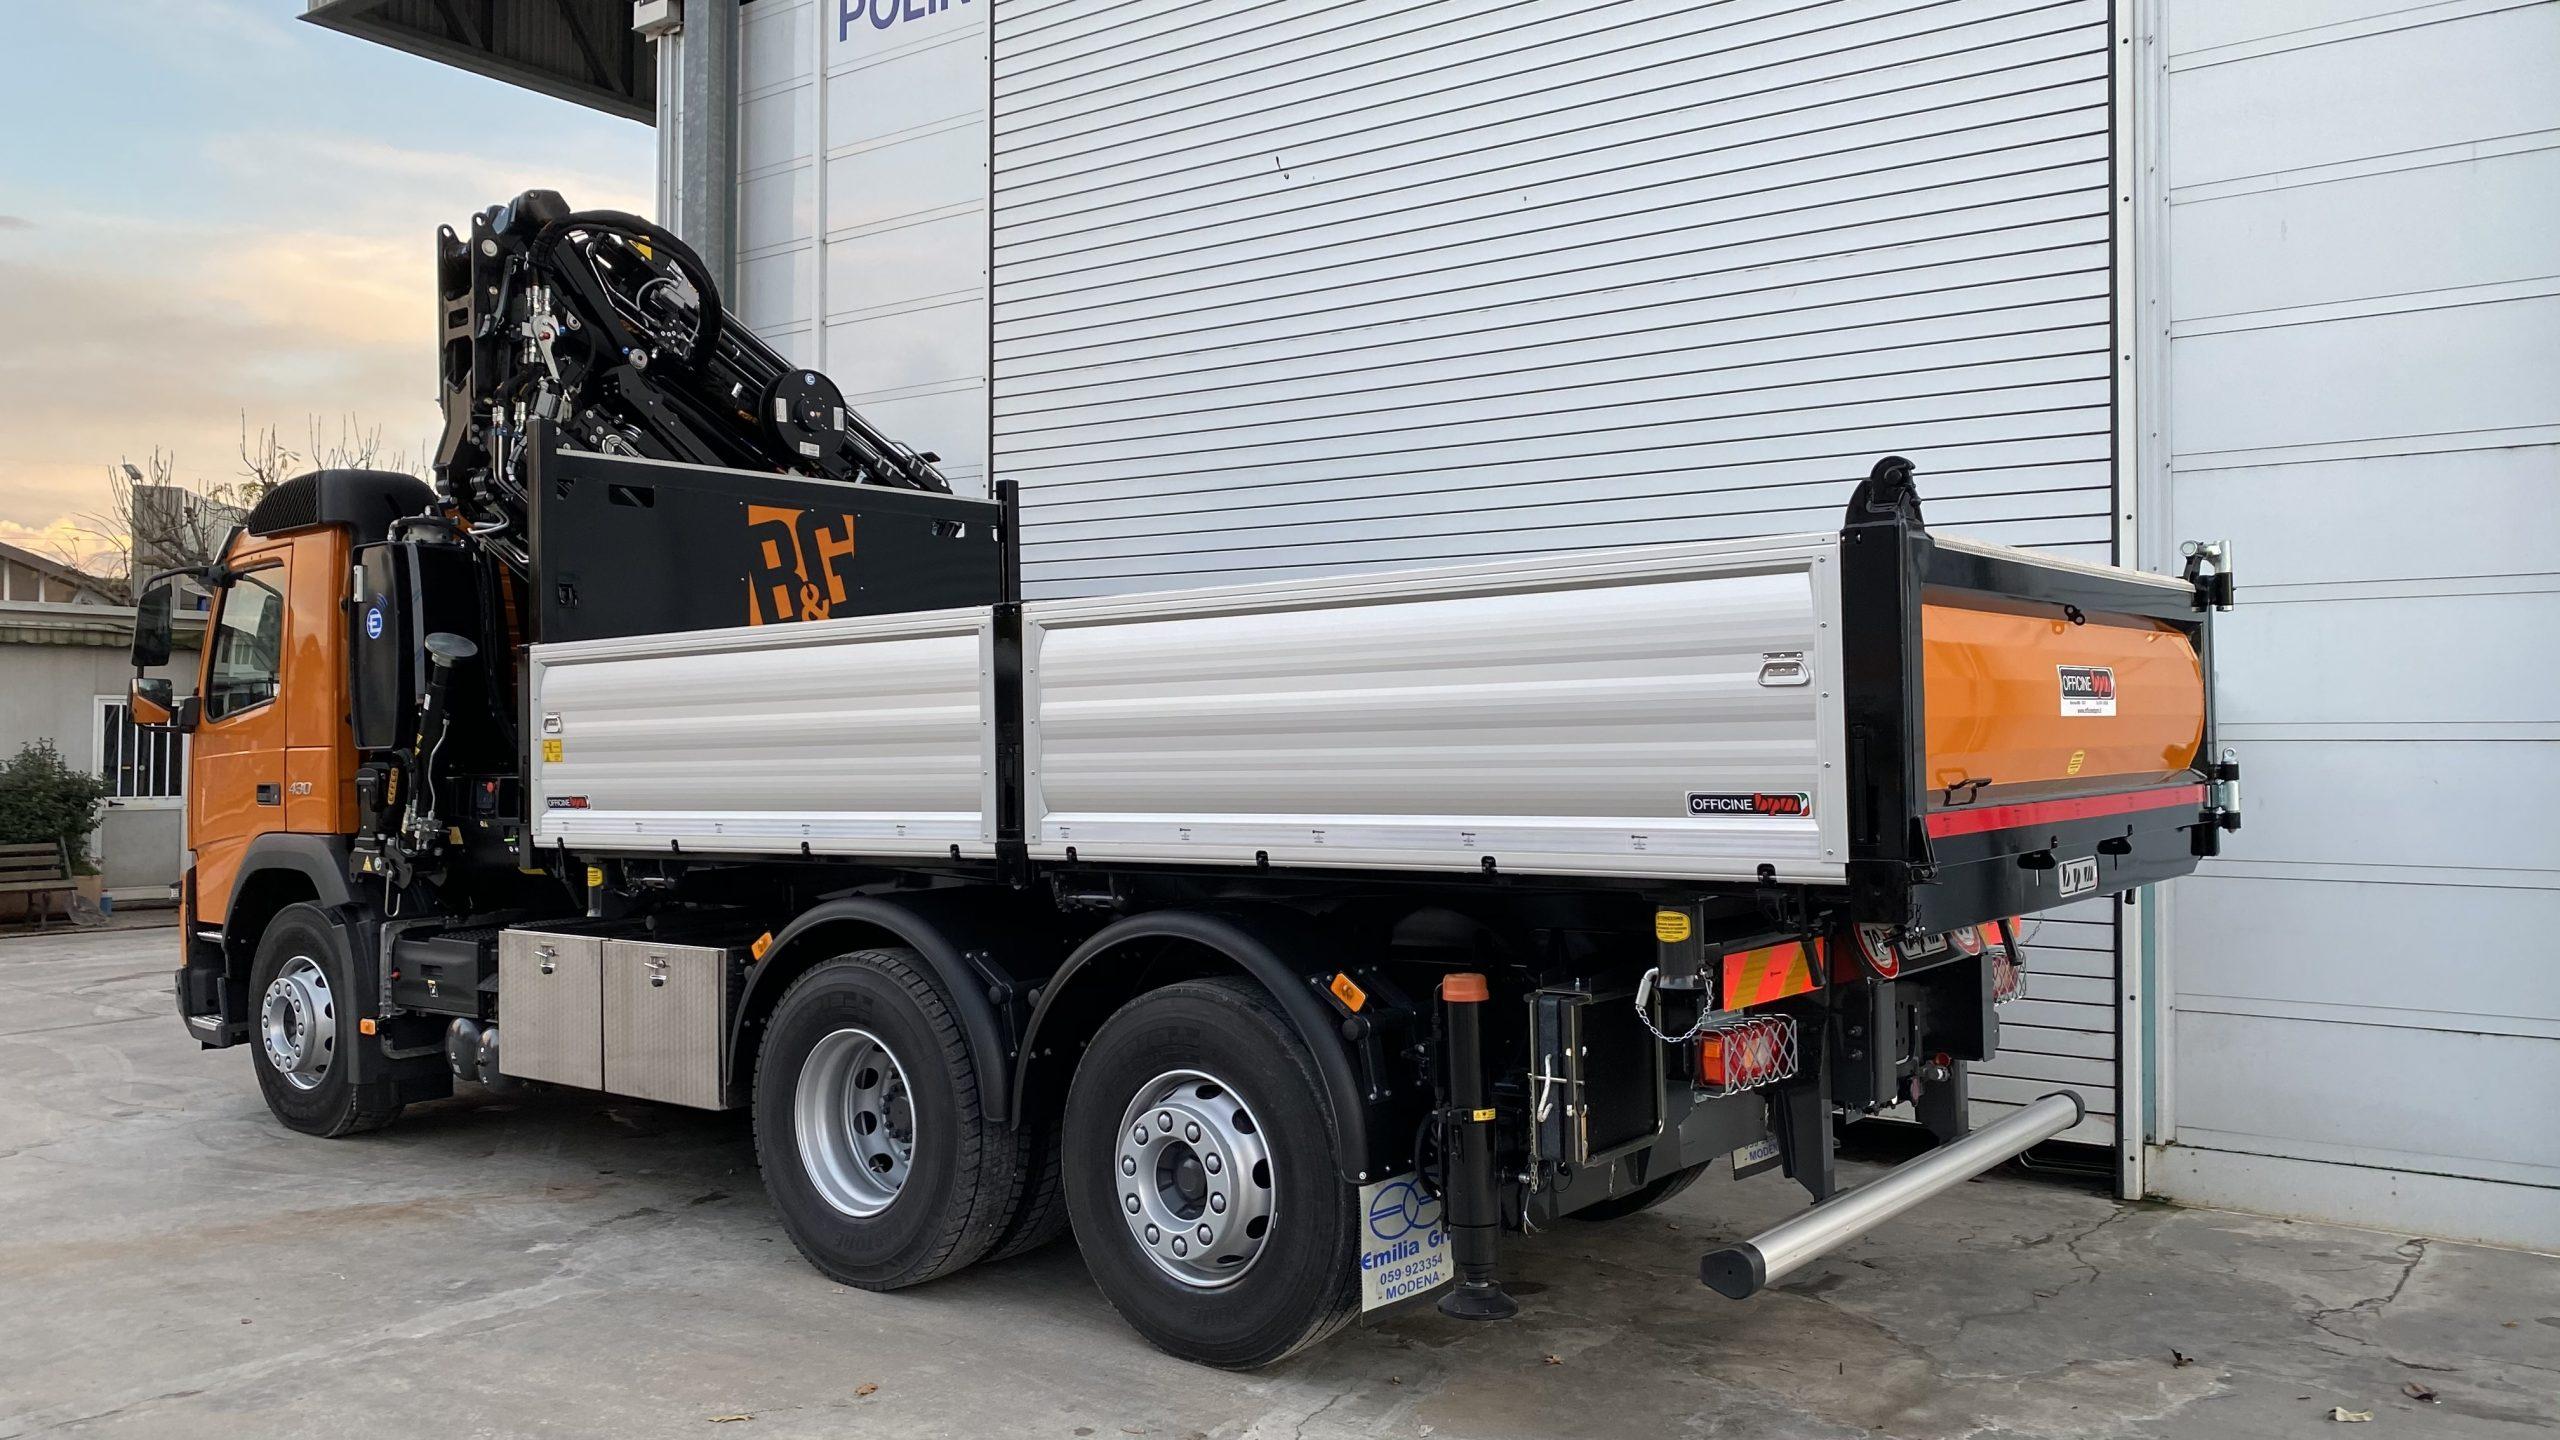 allestimento camion impresa edile